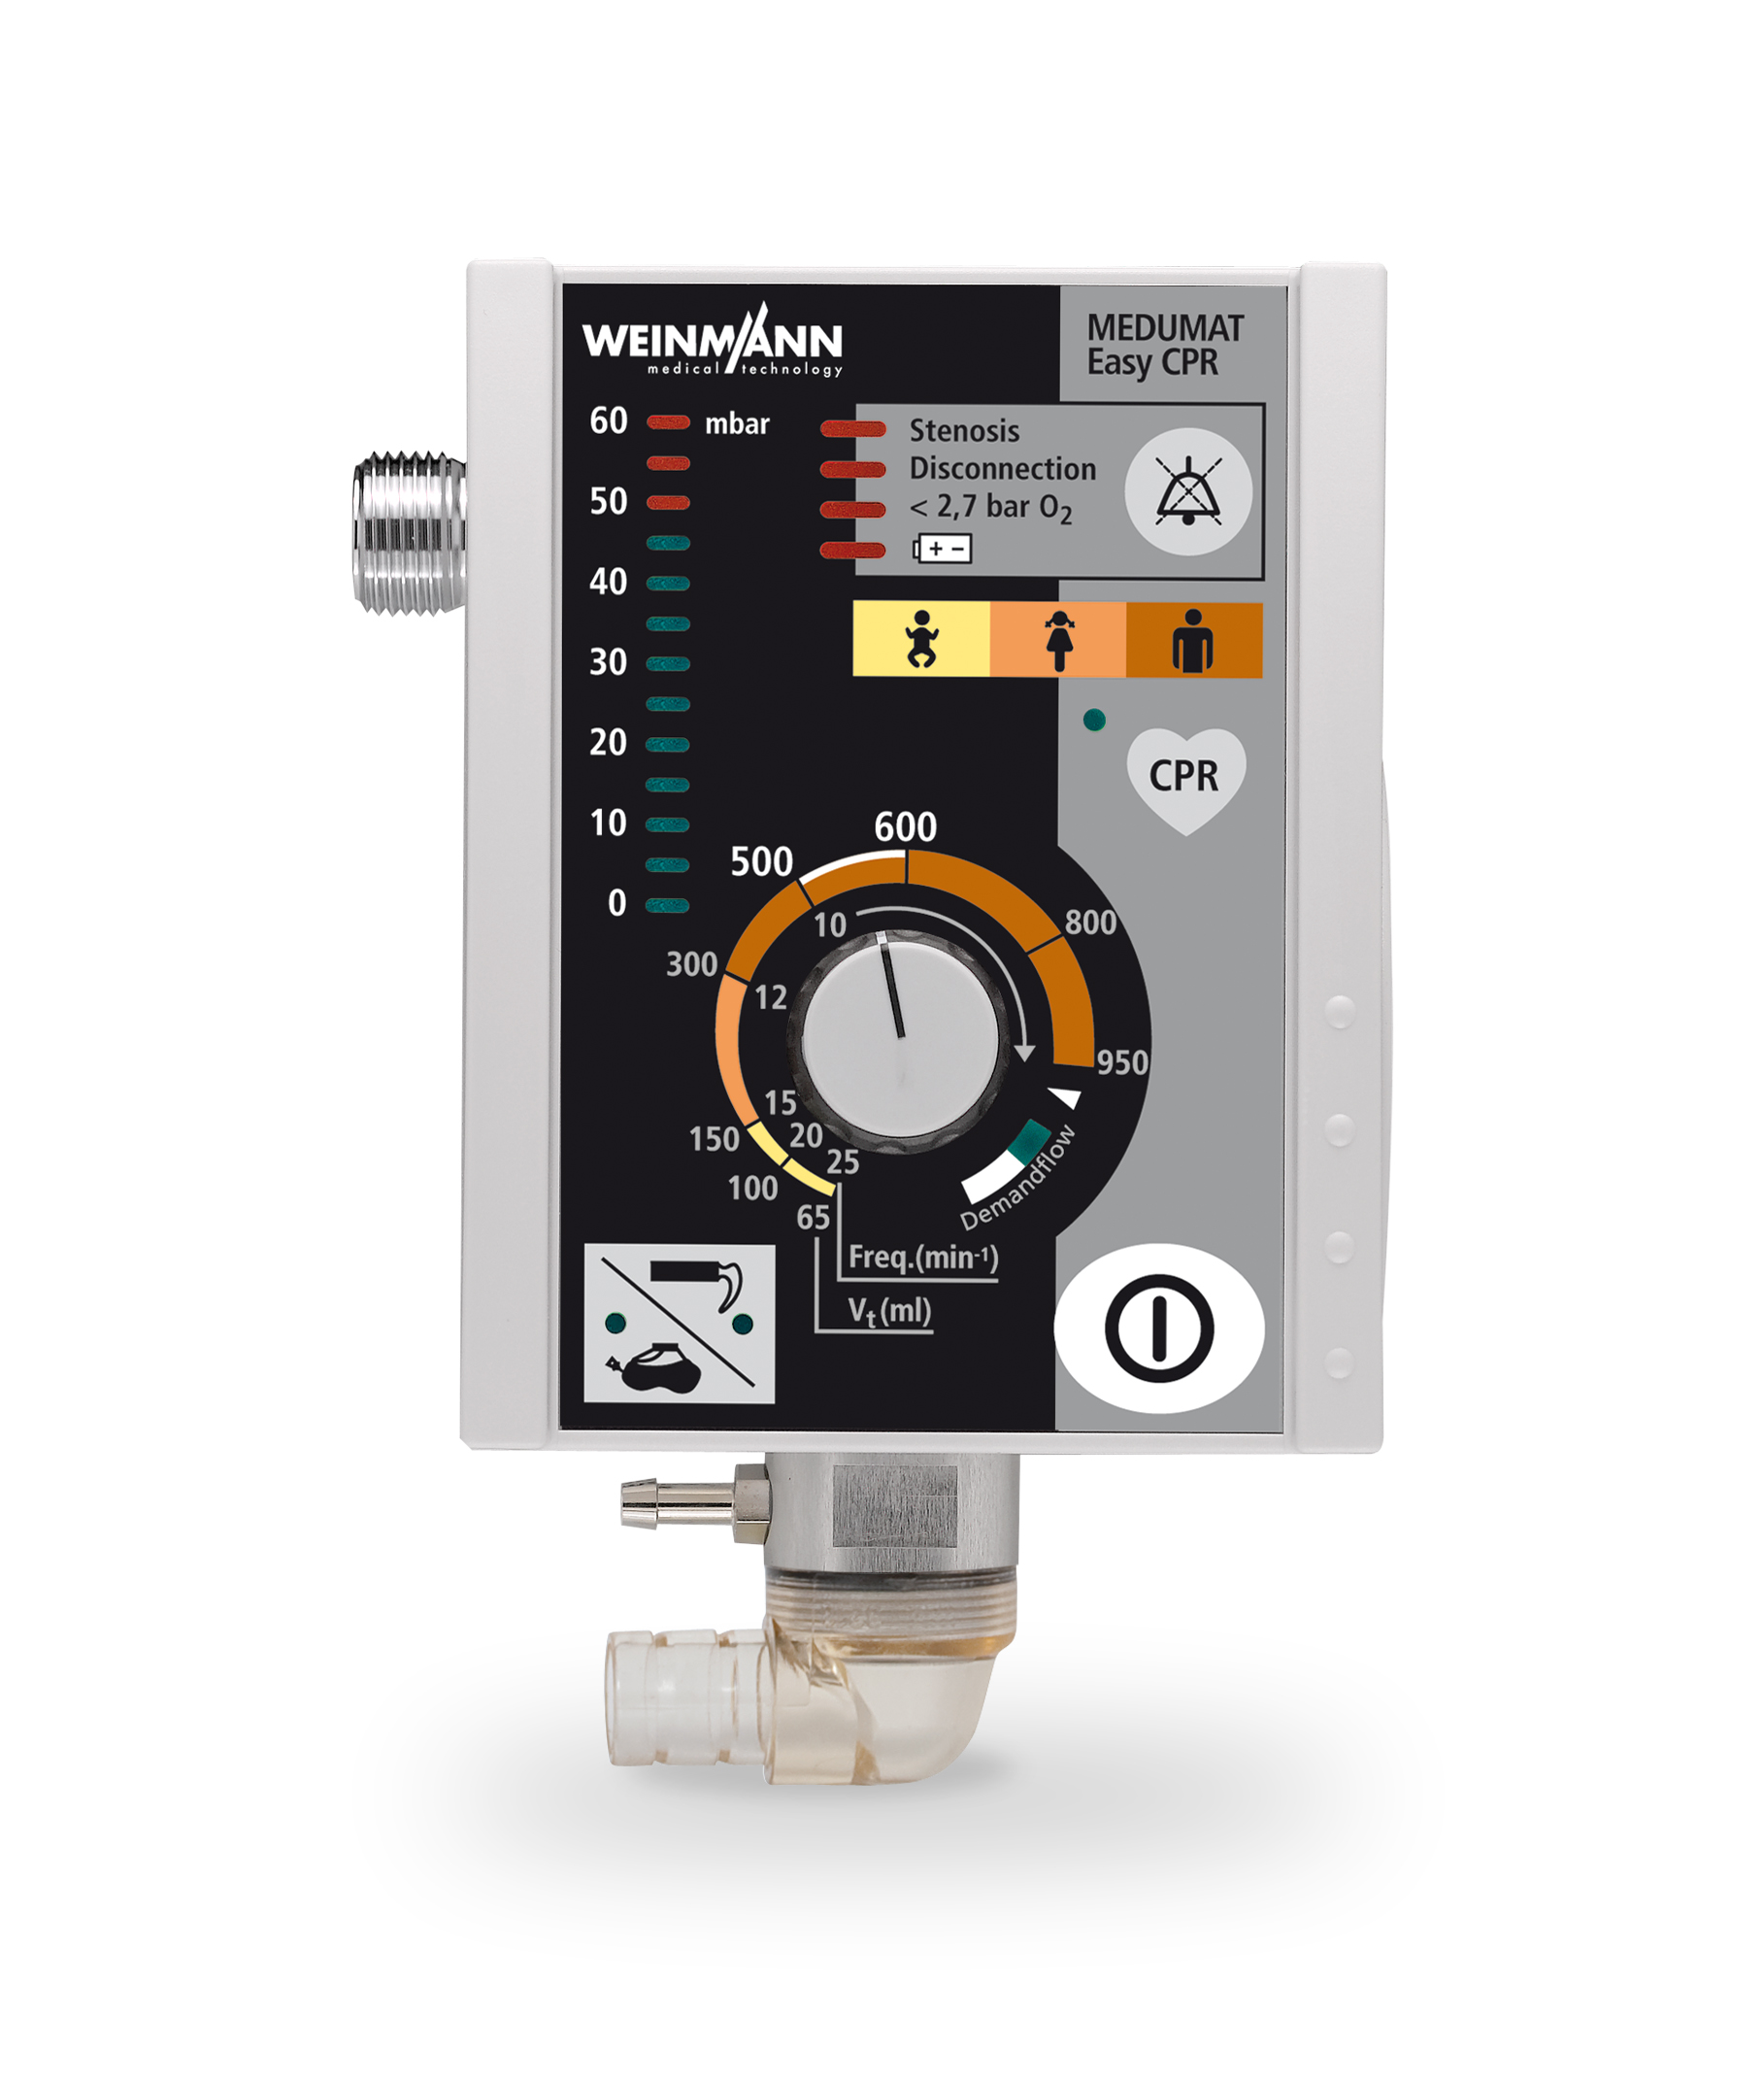 Defibrylator Meducore Standard Pro + Respirator Medumat Easy CPR na Life-Base 4 NG